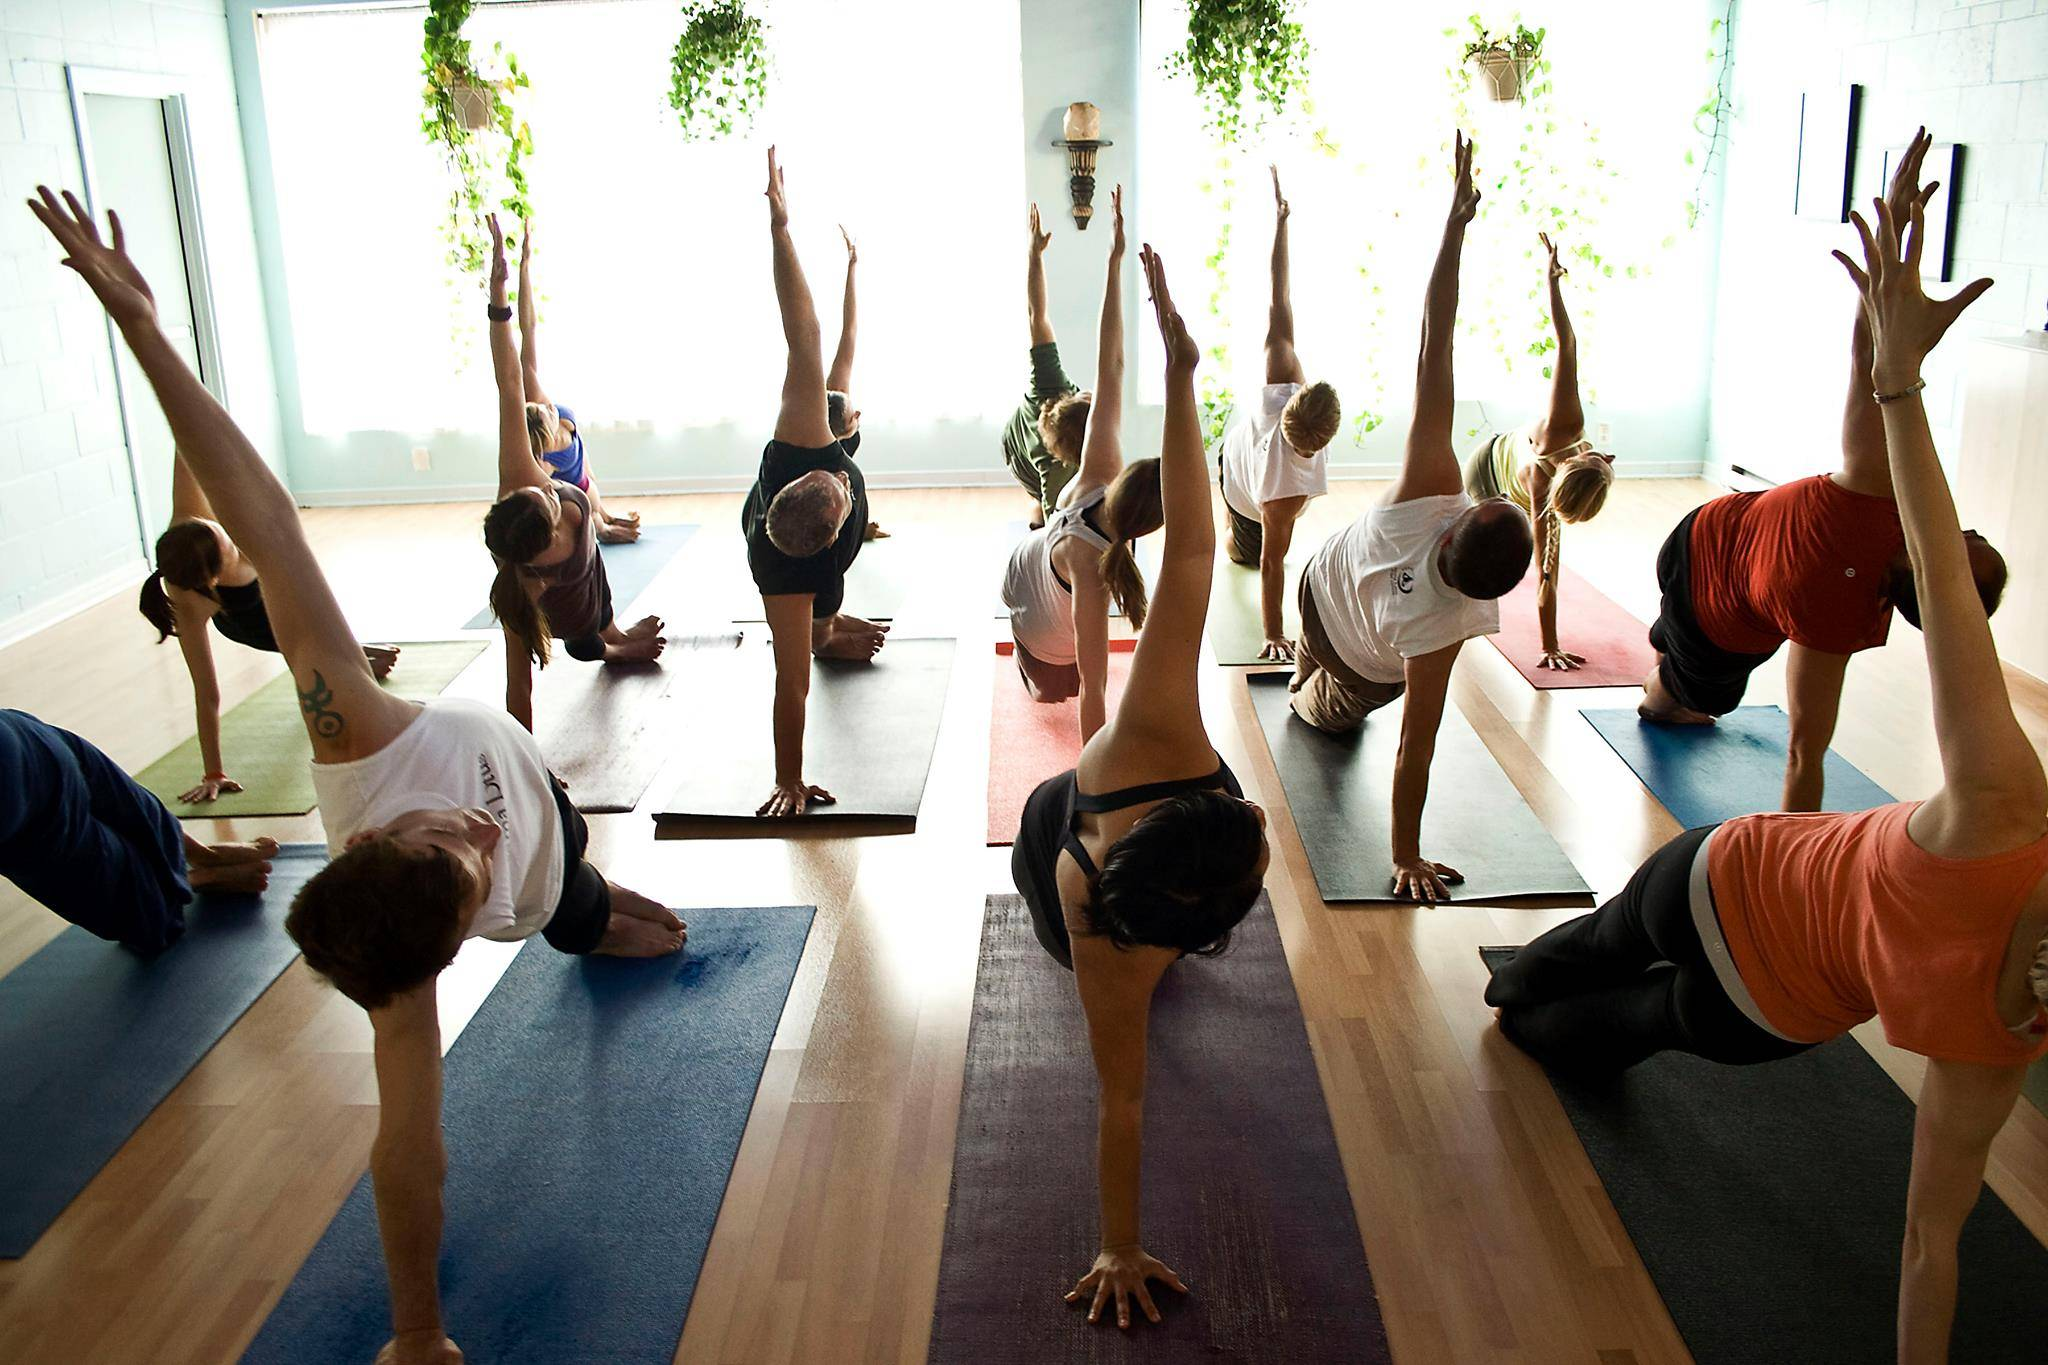 Презентация на тему история возникновения и развития йоги